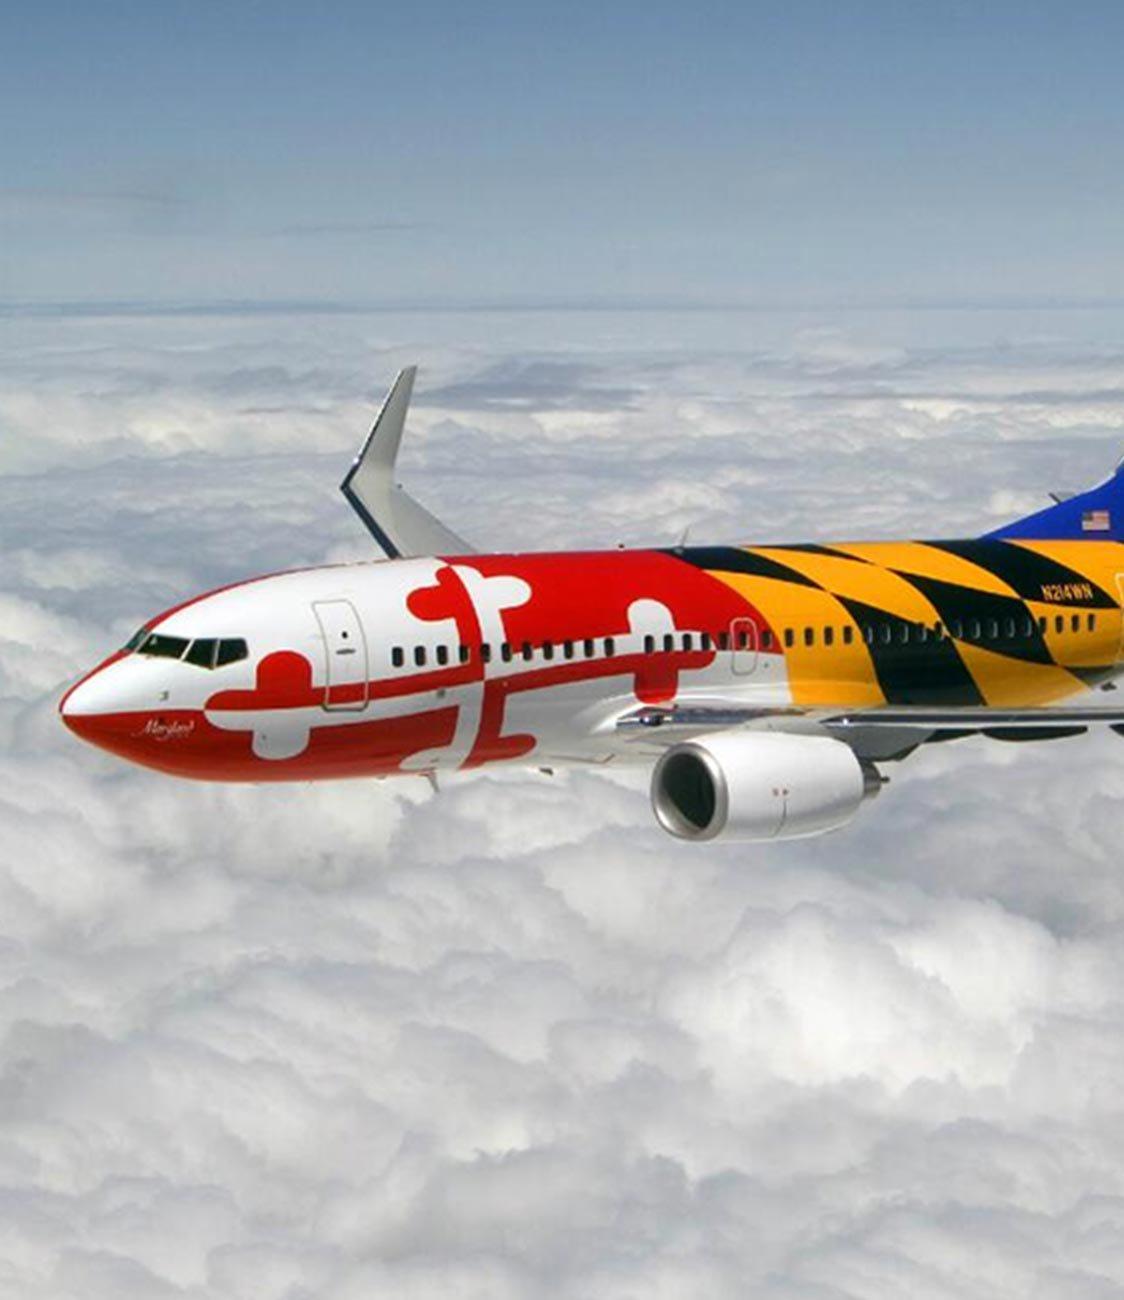 Maryland plane